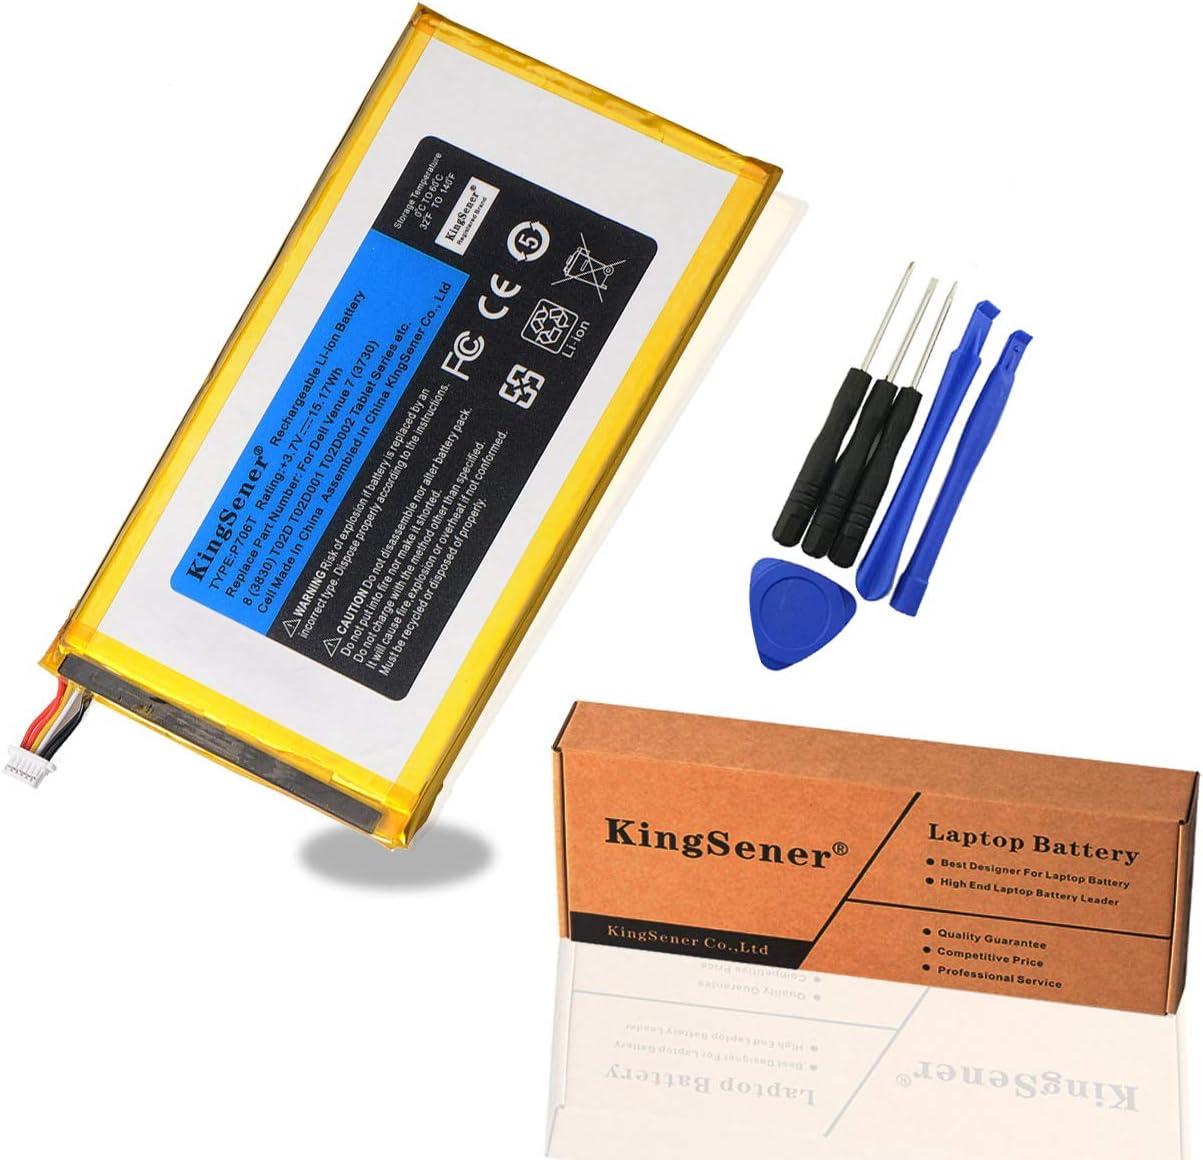 KingSener New 3.7V 15.17WH P706T Tablet Battery for DELL Venue 7 3730 Venue 8 3830 T01C T02D001 T02D002 0CJP38 02PDJW